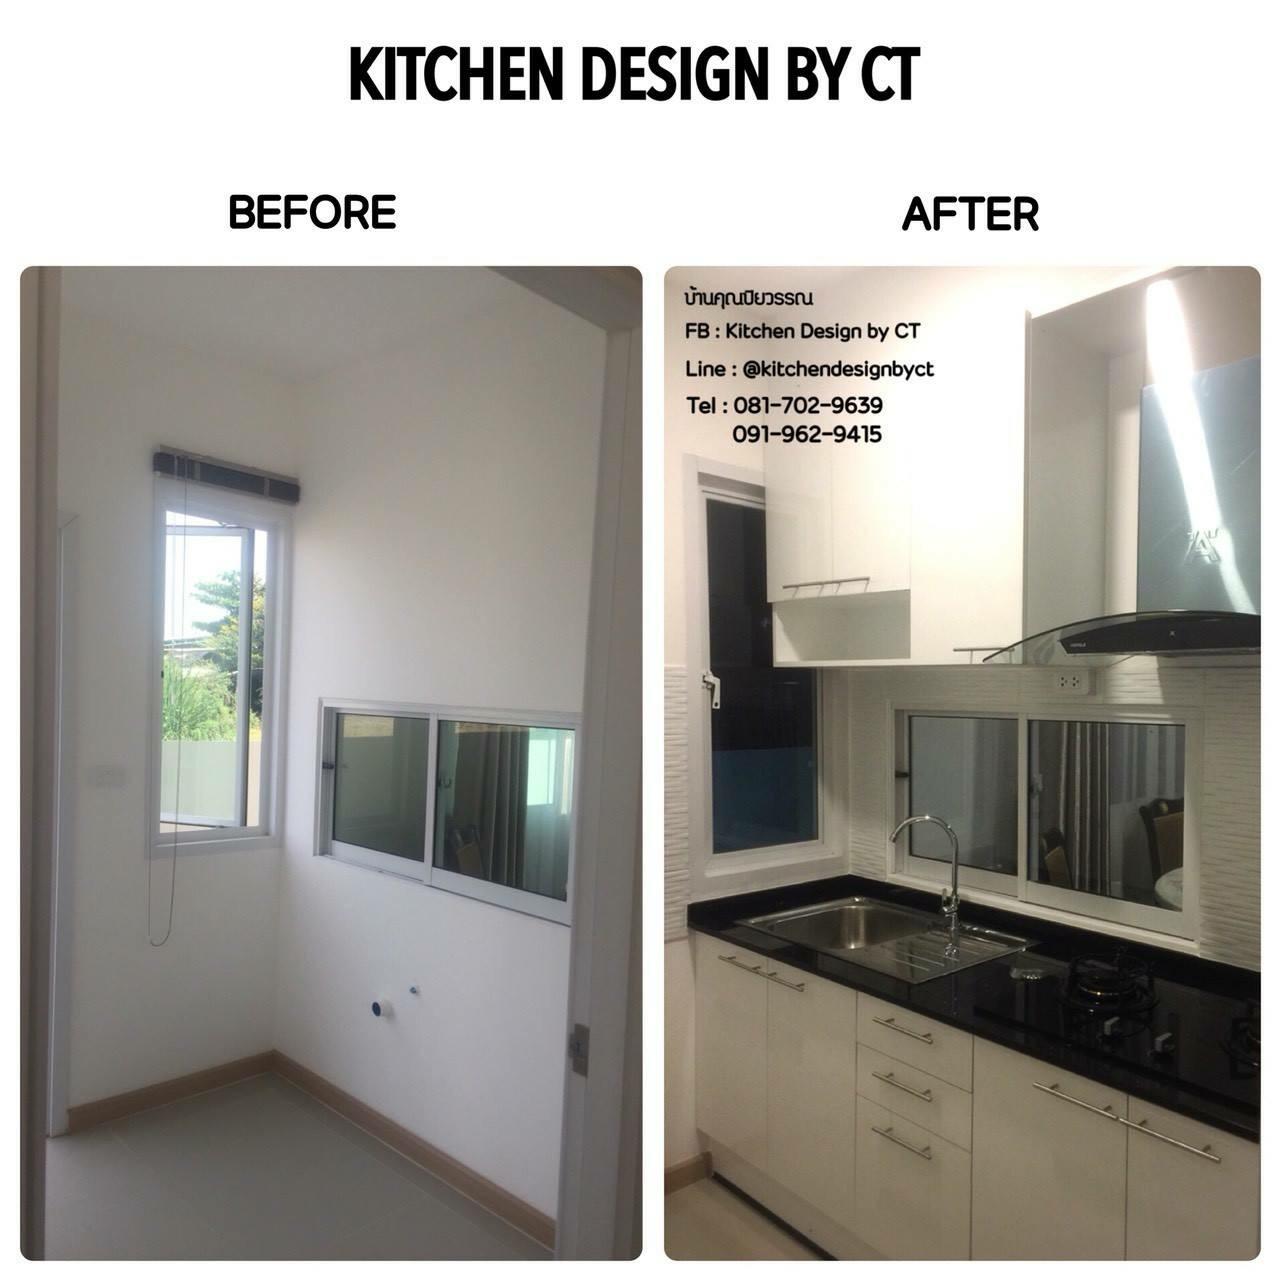 Glossy White Modern Kitchen (ครัวบิวท์อินหน้าบานขาวเงาสไตล์โมเดิร์น)